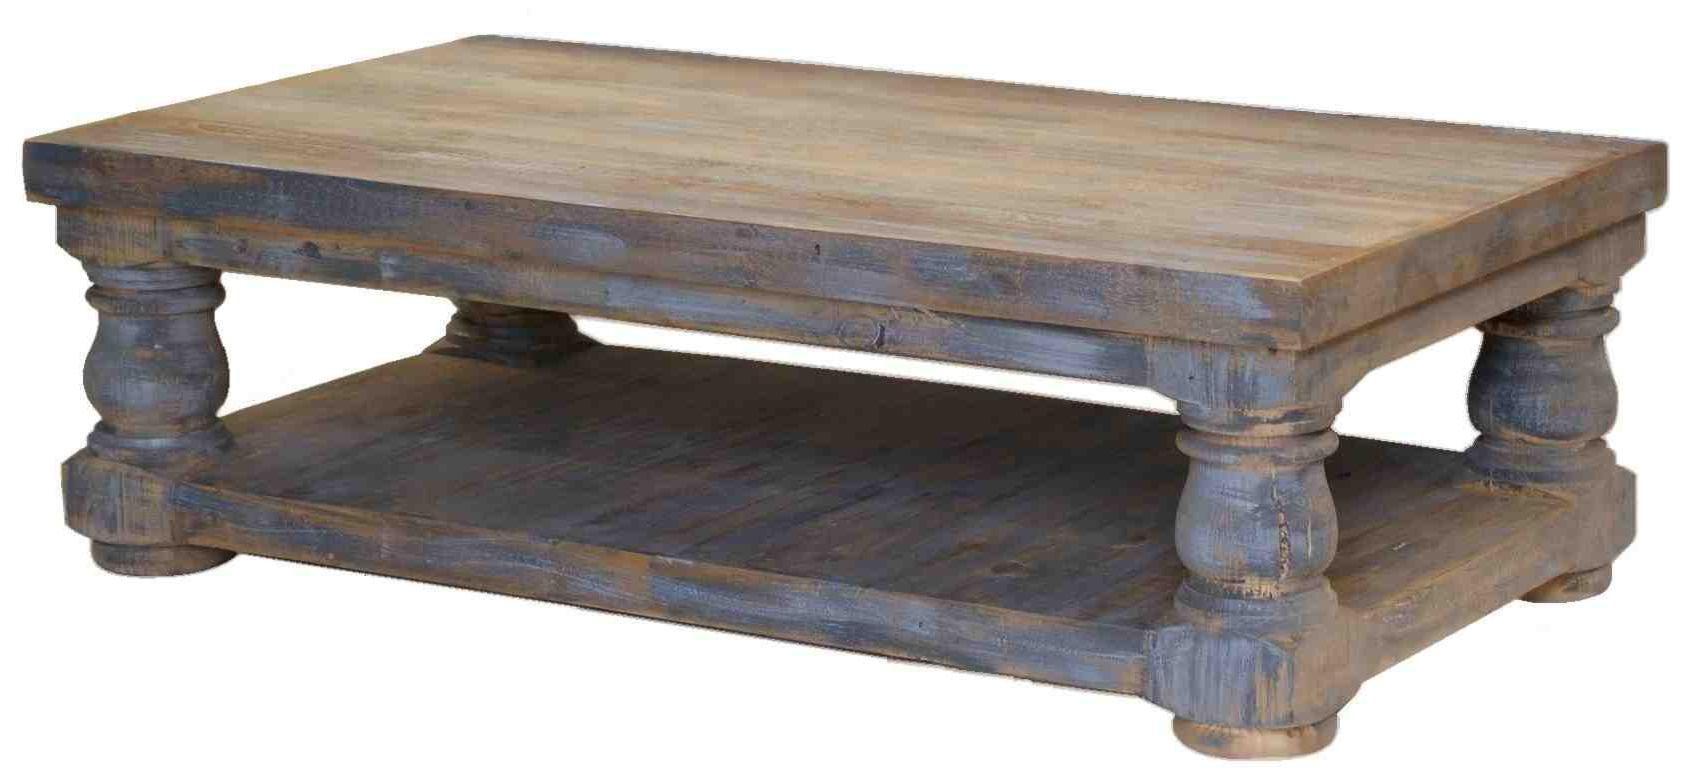 furniture source international accent tables | leoma, lawrenceburg